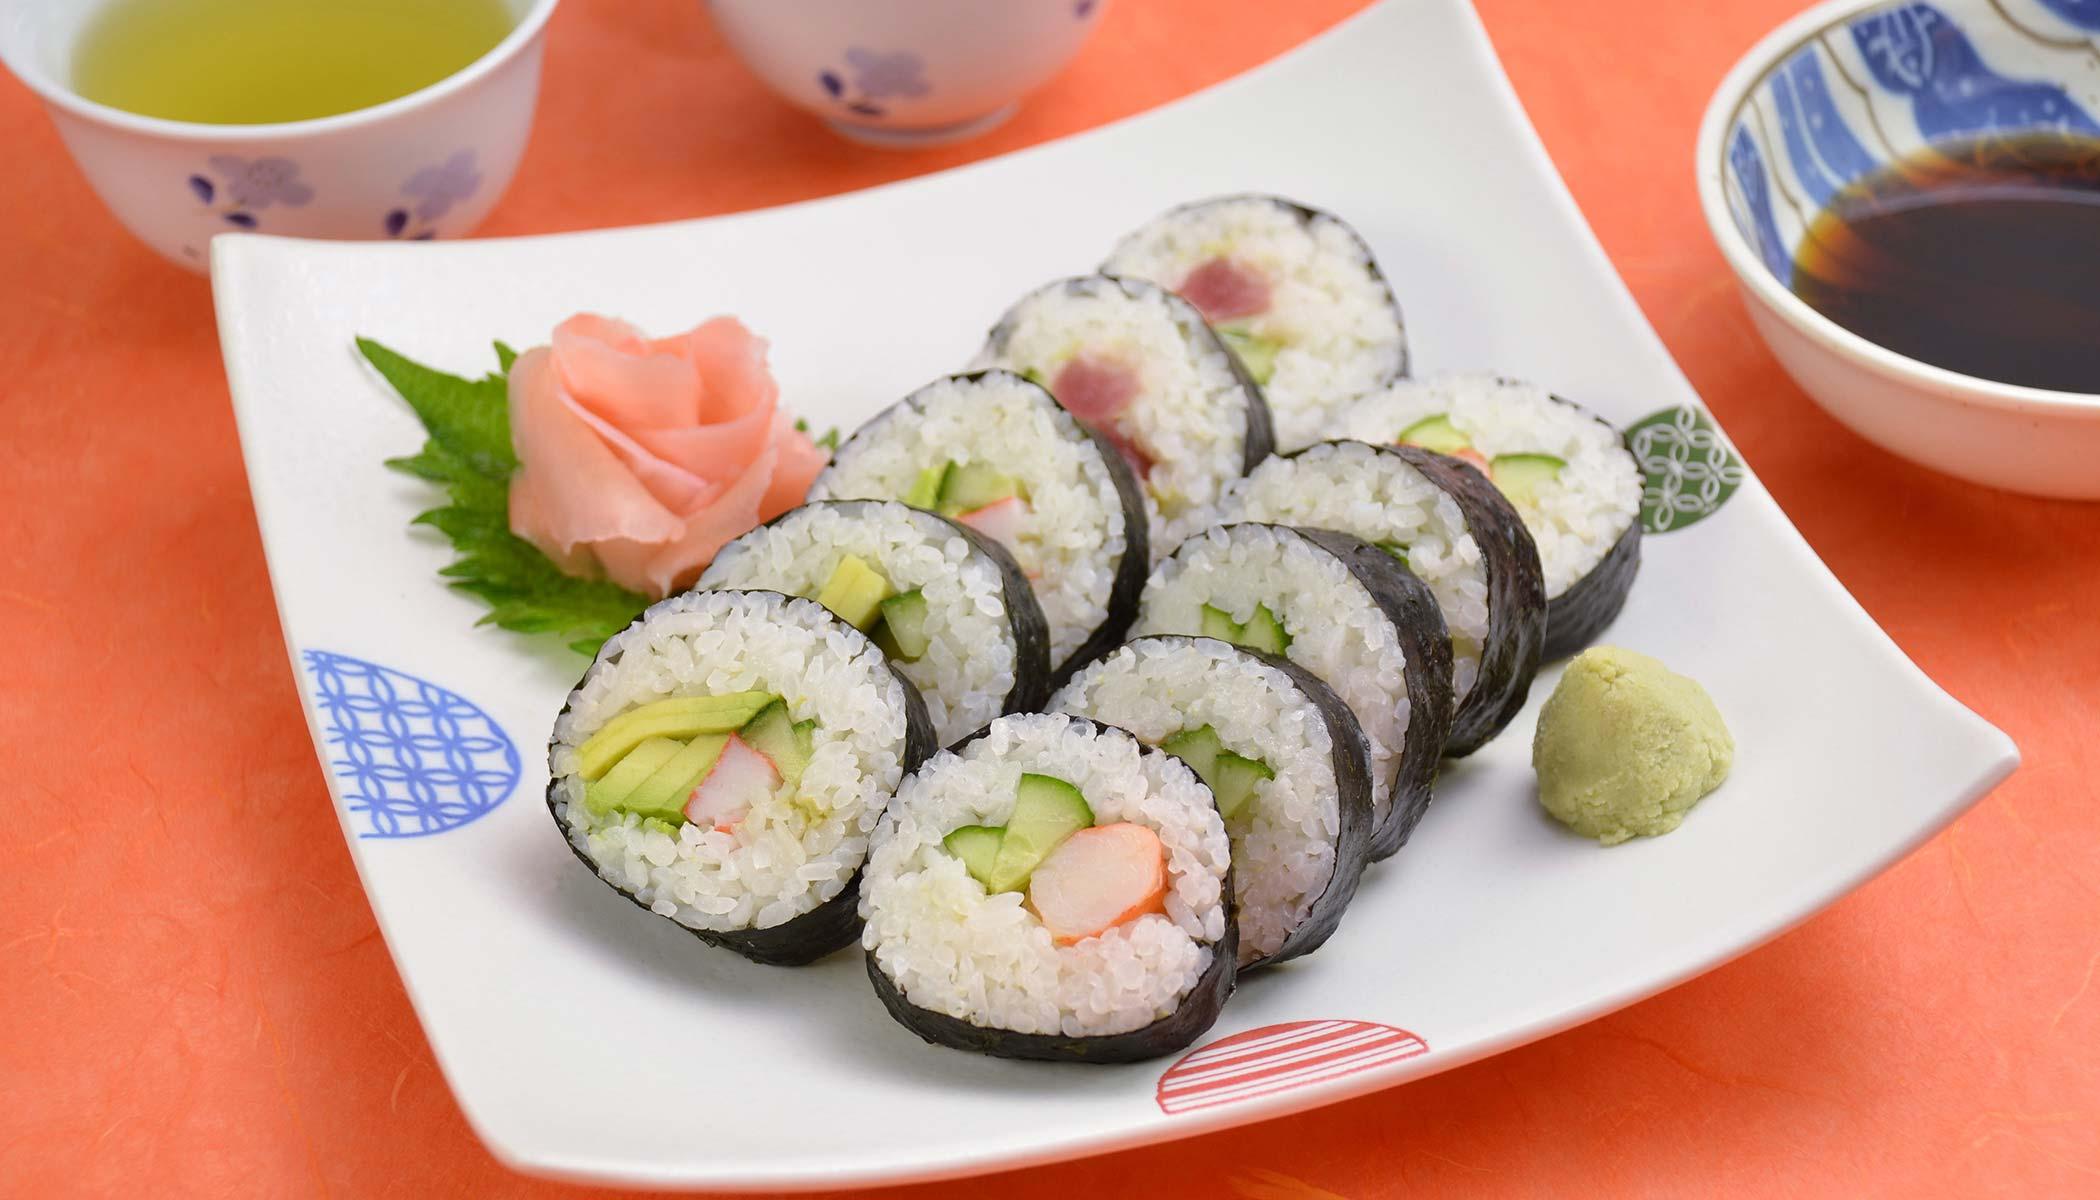 <i>Maki Sushi</i> (<i>Sushi</i> Roll)